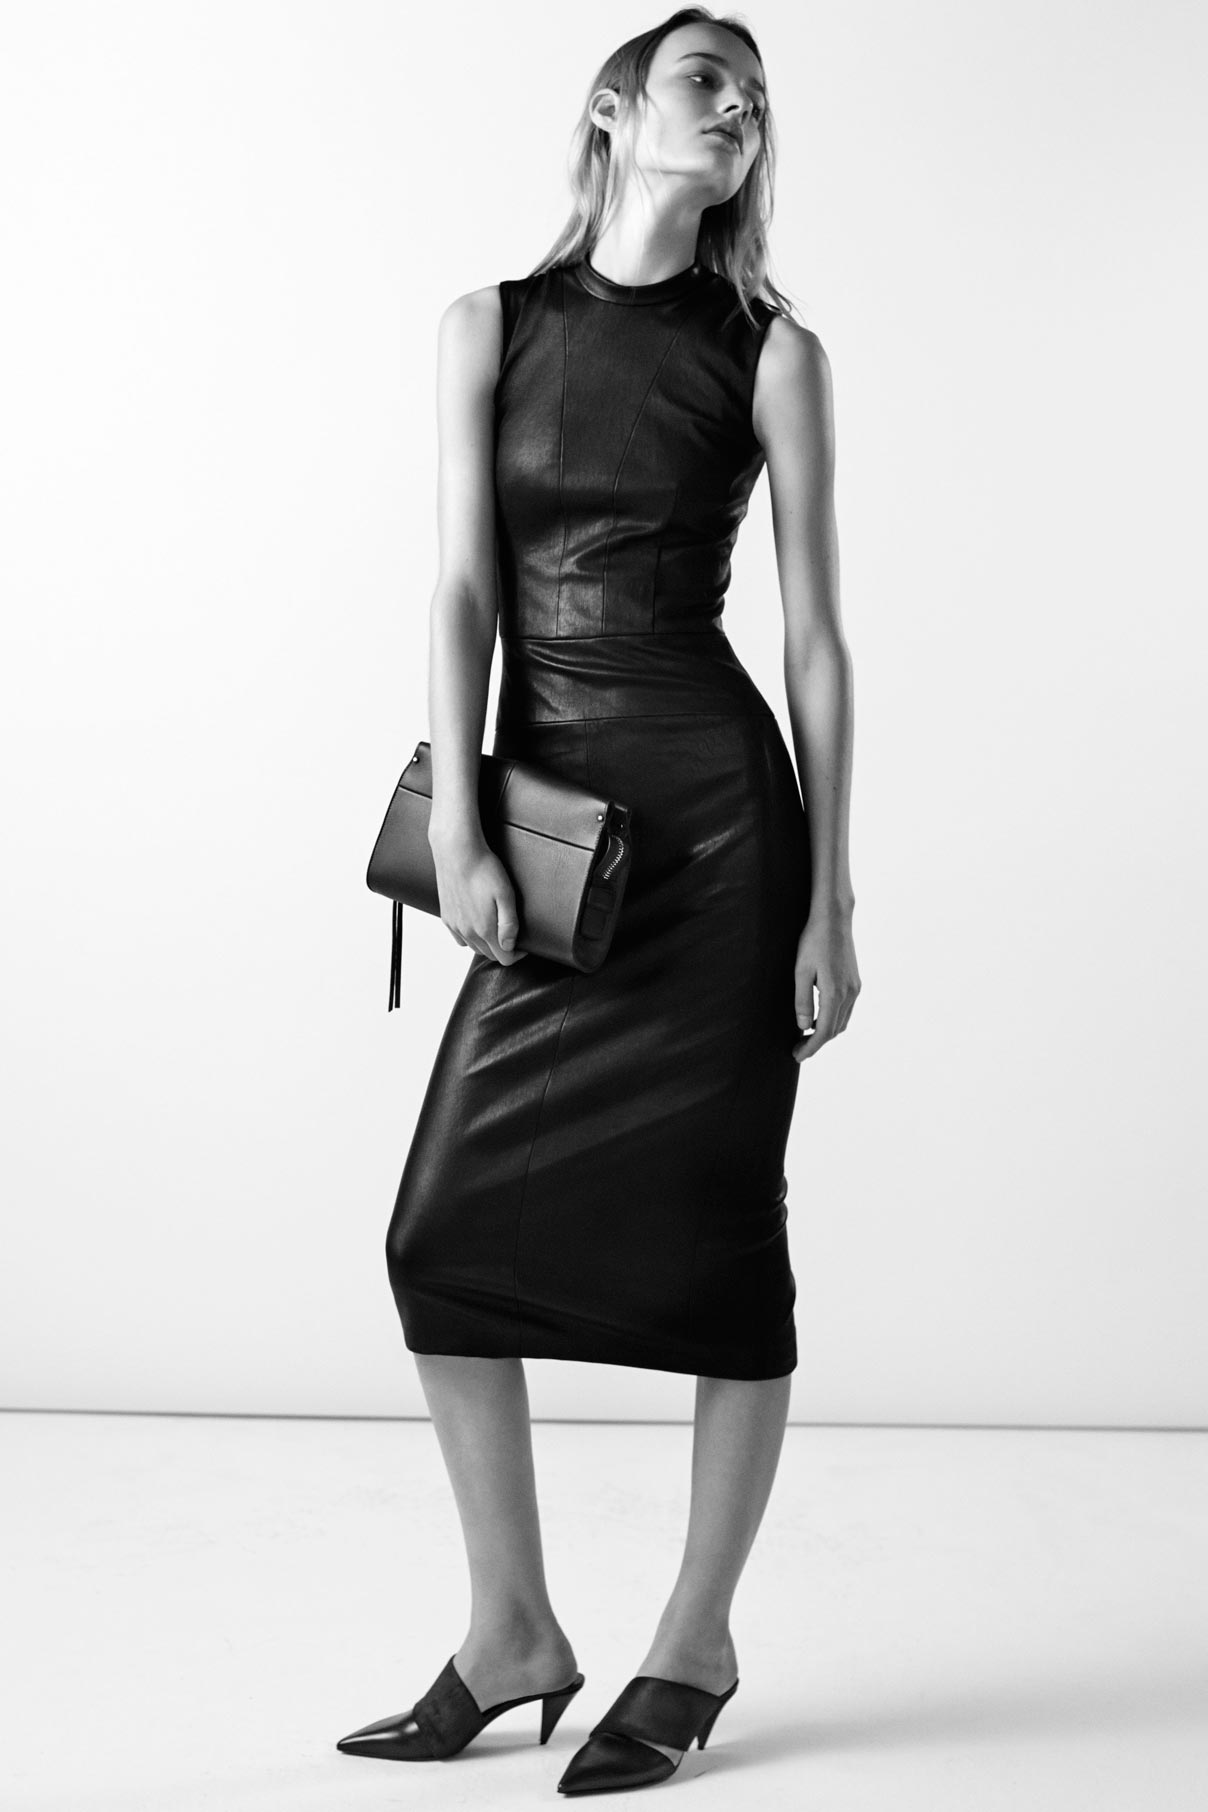 Look 5 Black stretch leather dress.